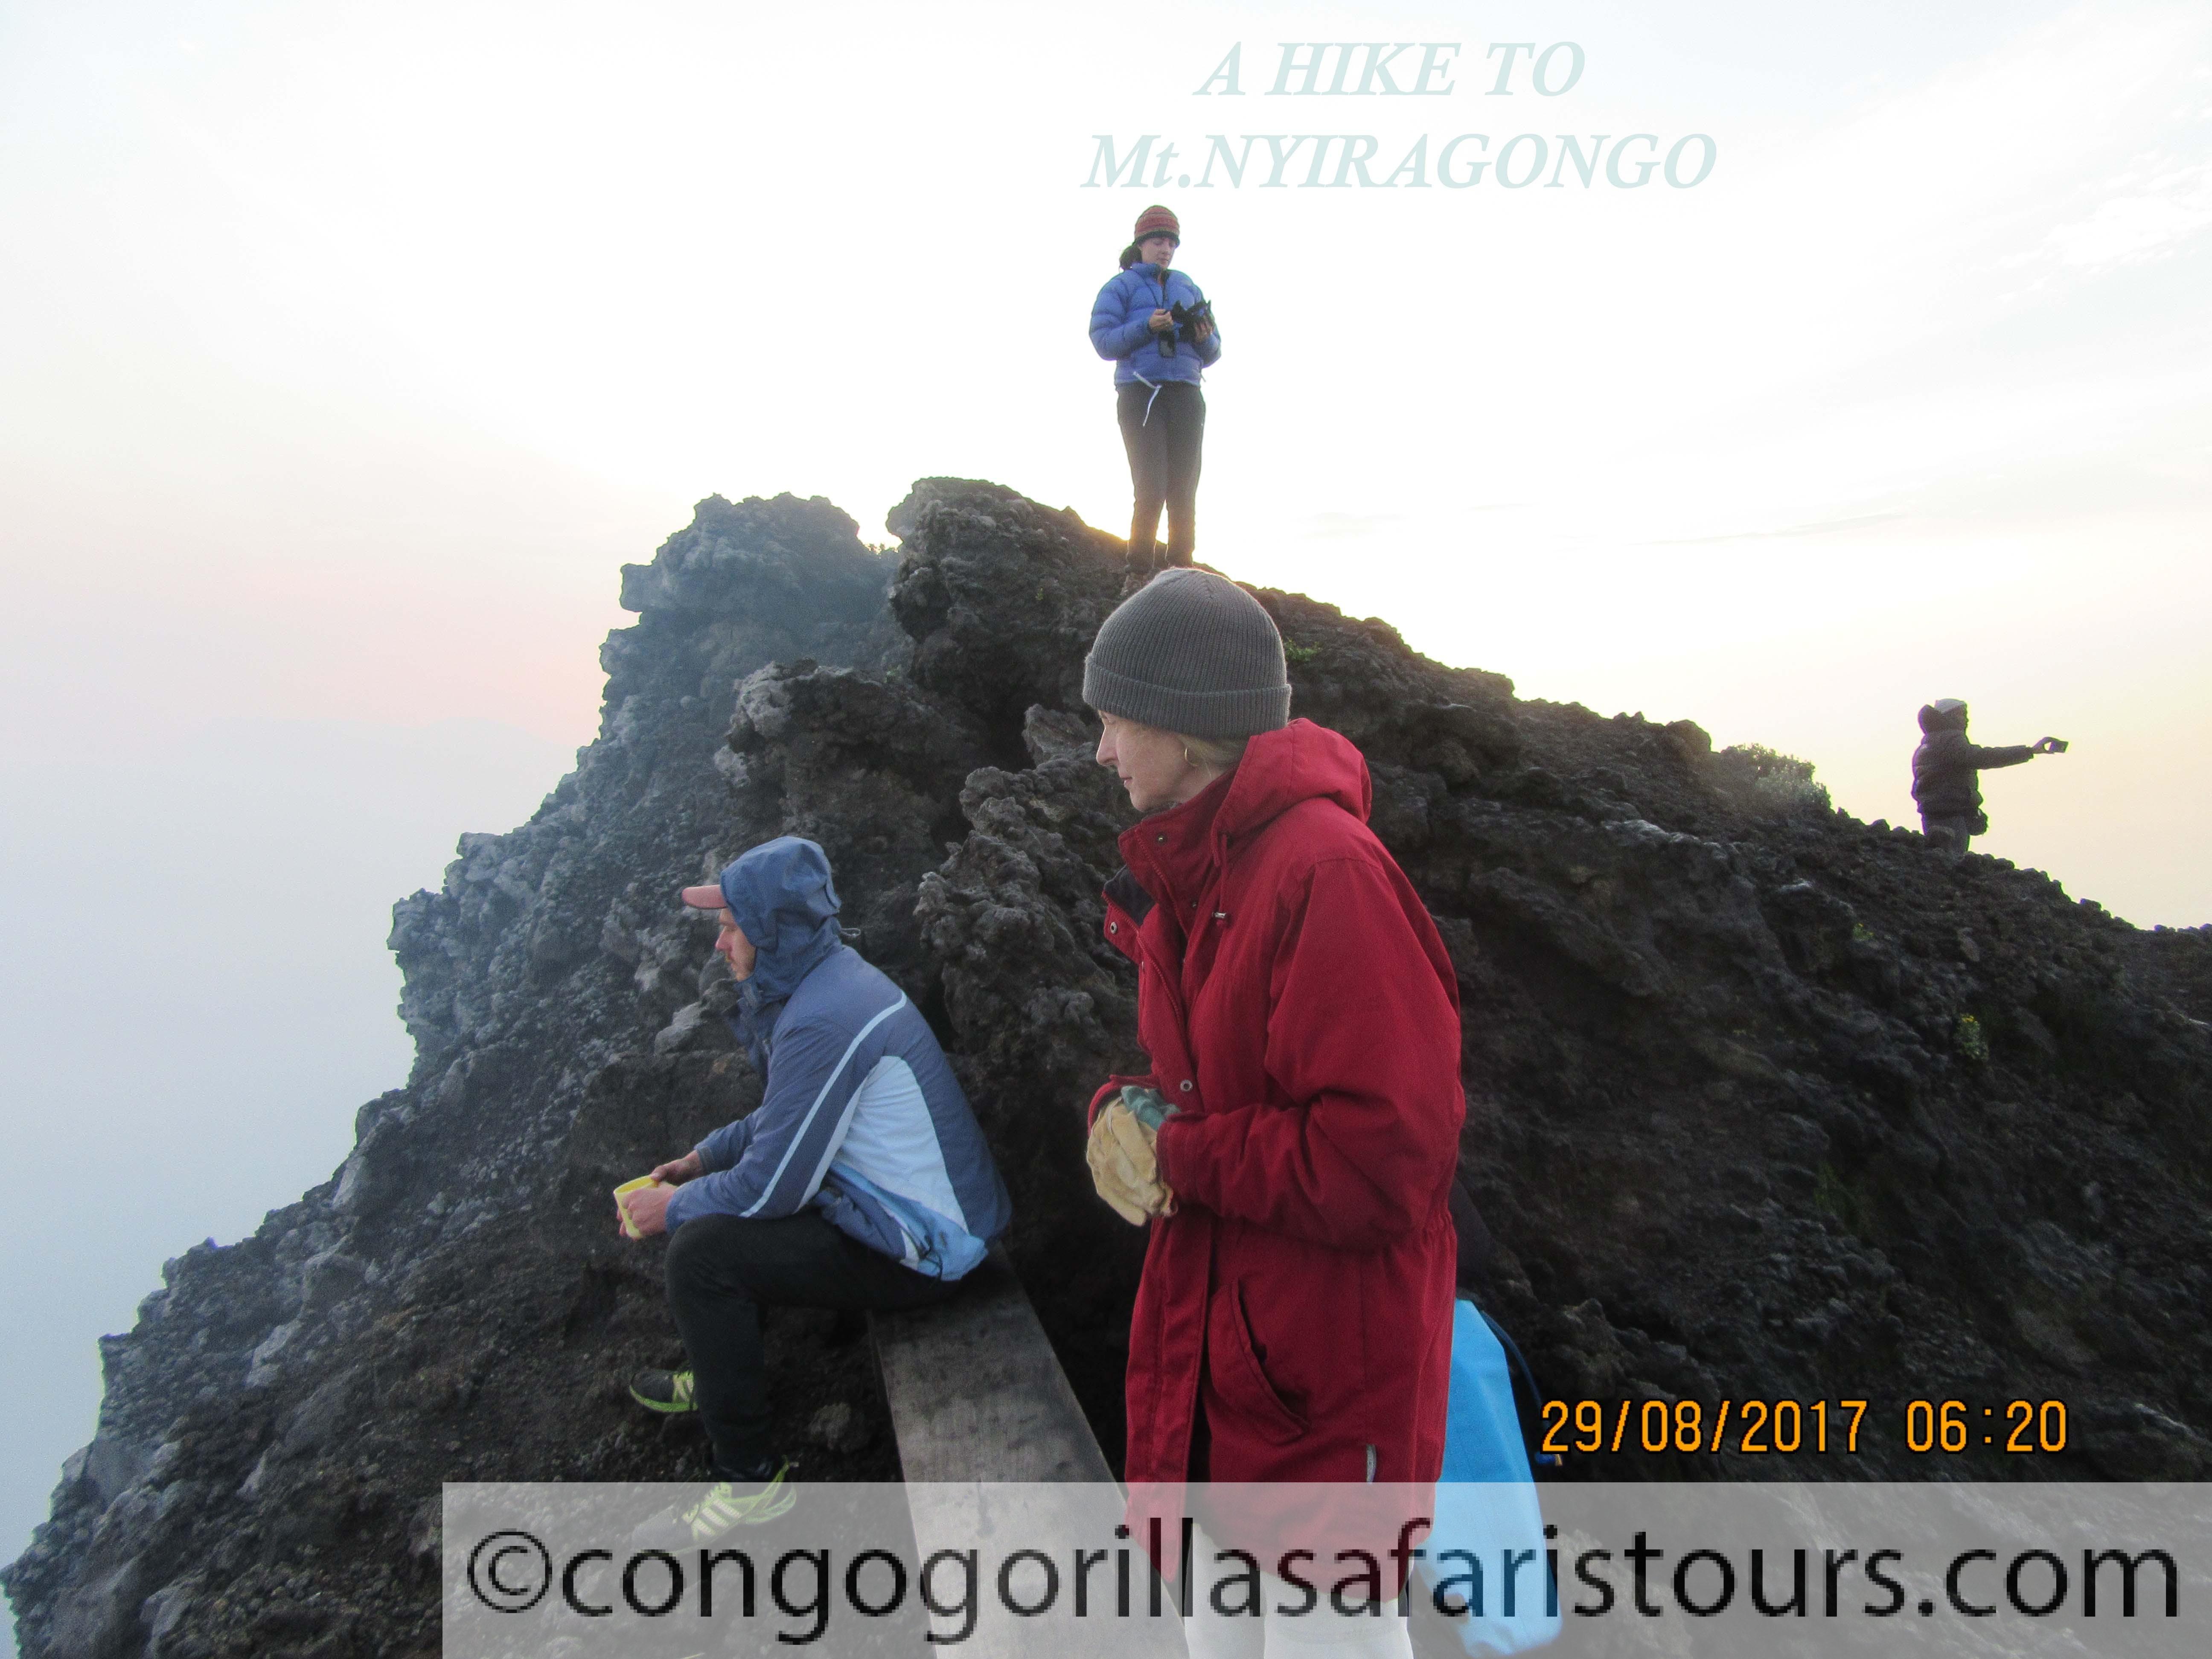 A hike to Mount Nyiragongo